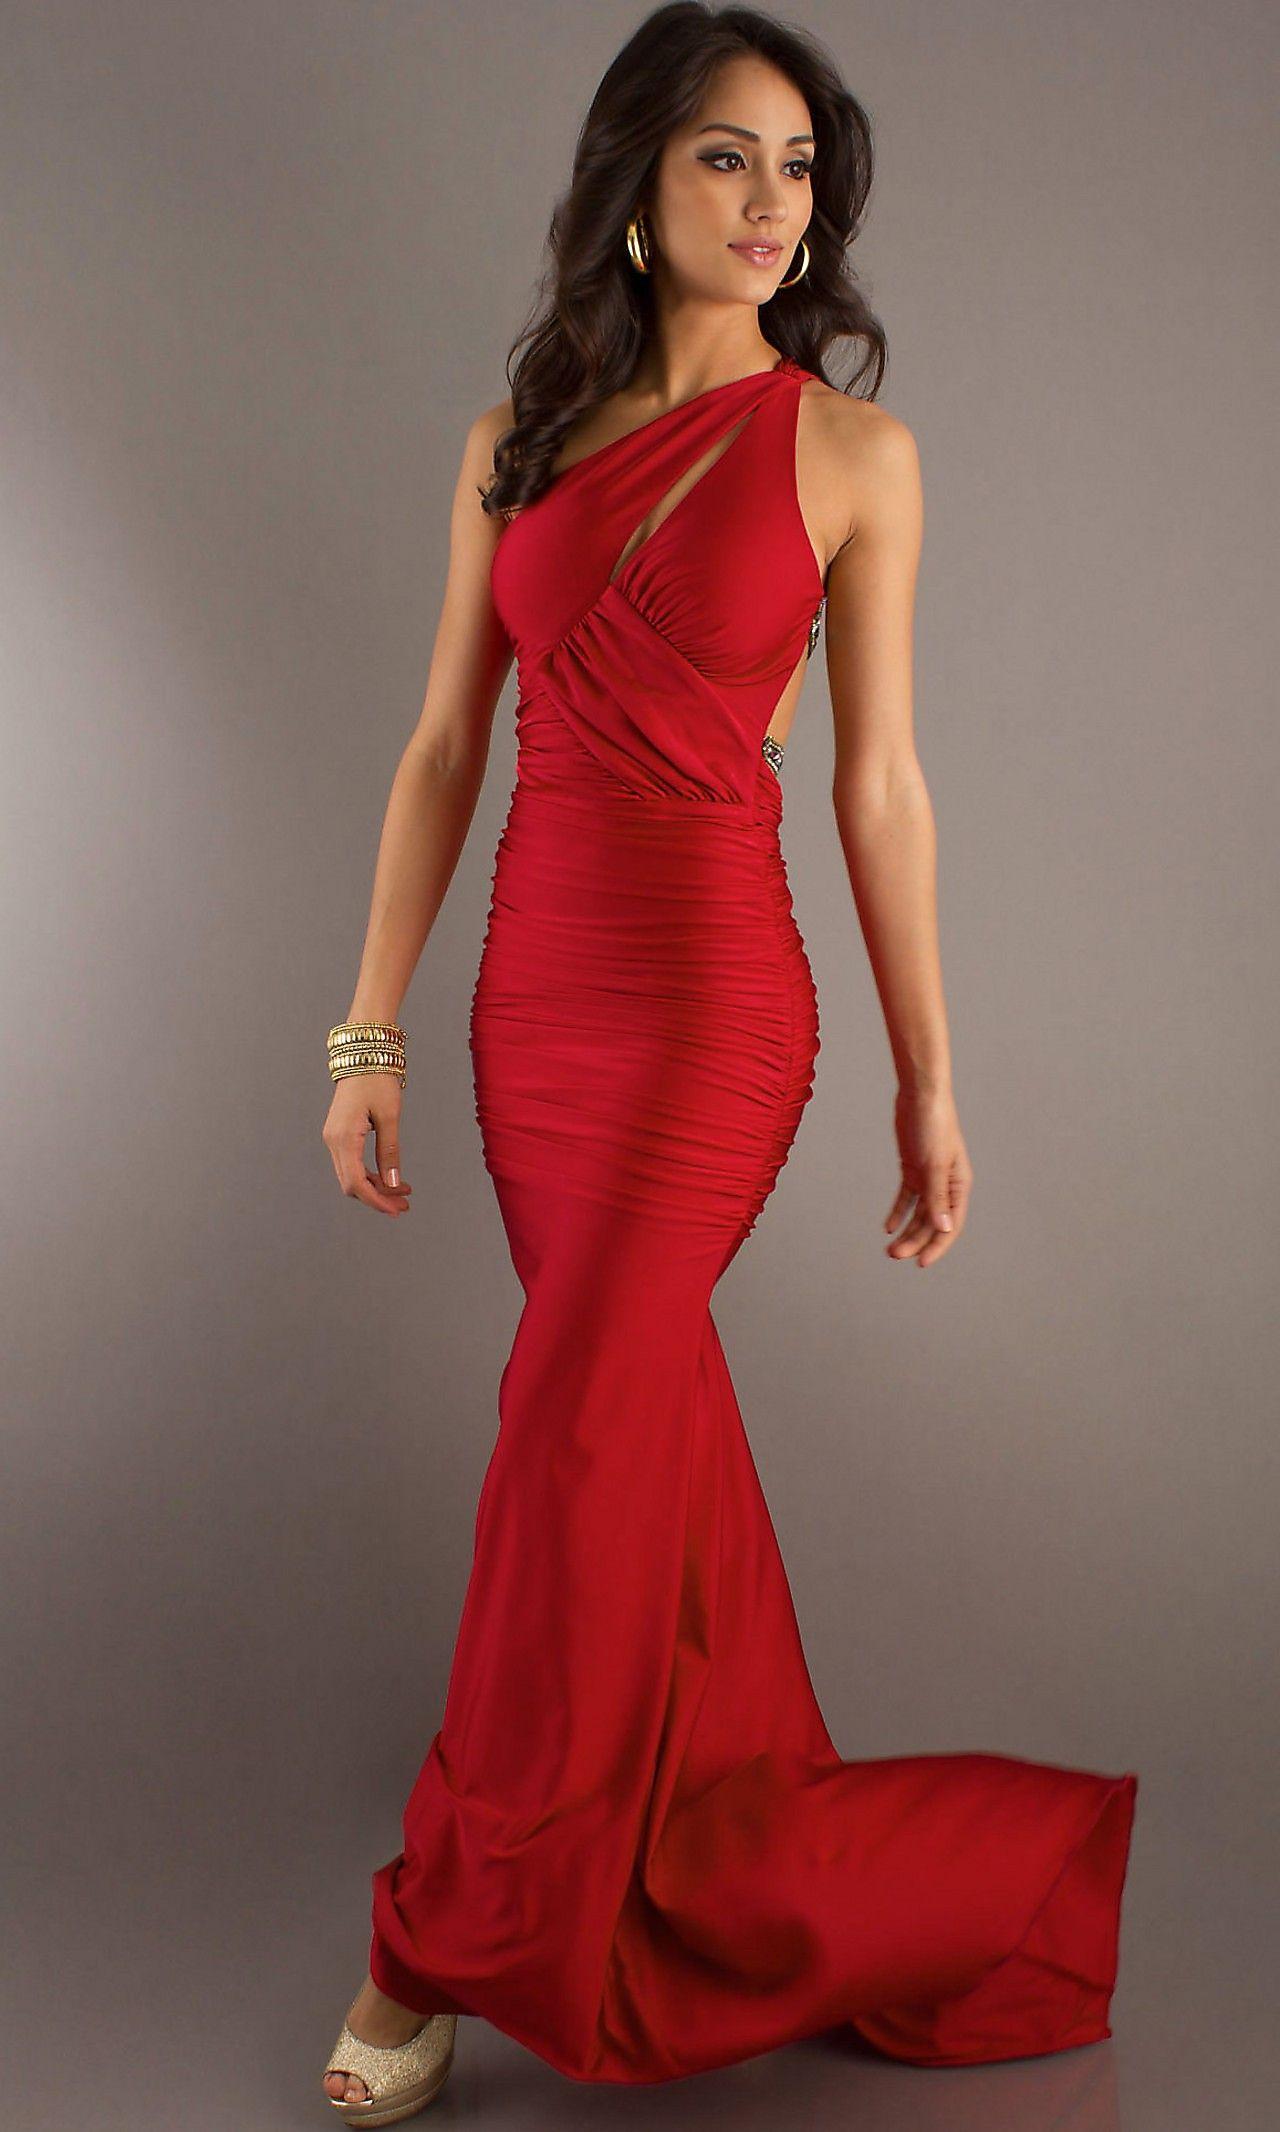 15 Erstaunlich Abendkleid Lang Rot Boutique20 Luxurius Abendkleid Lang Rot Design